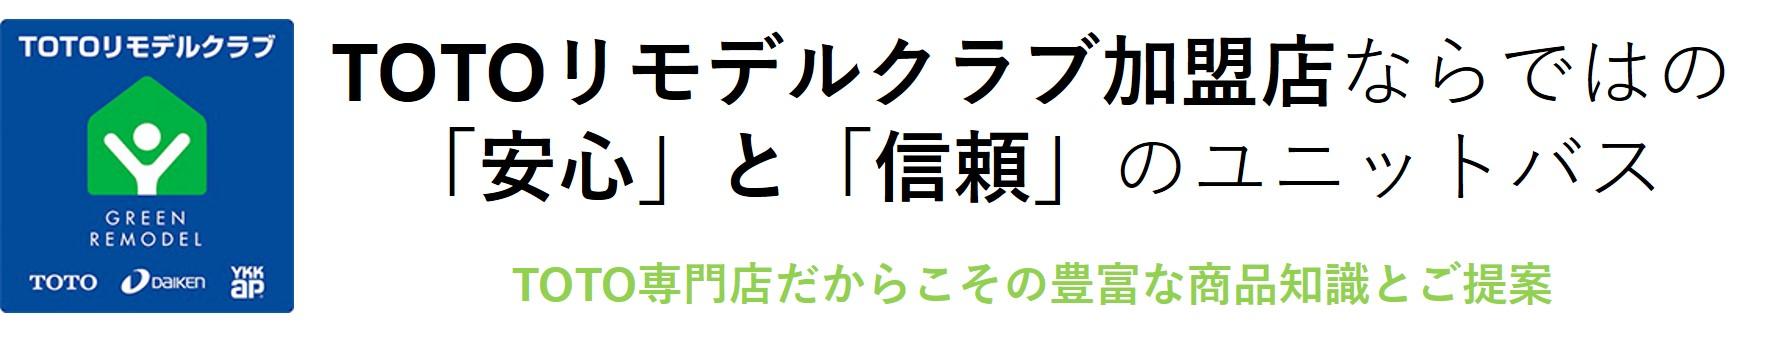 TOTO お風呂 リフォーム さいたま 東京 神奈川 千葉